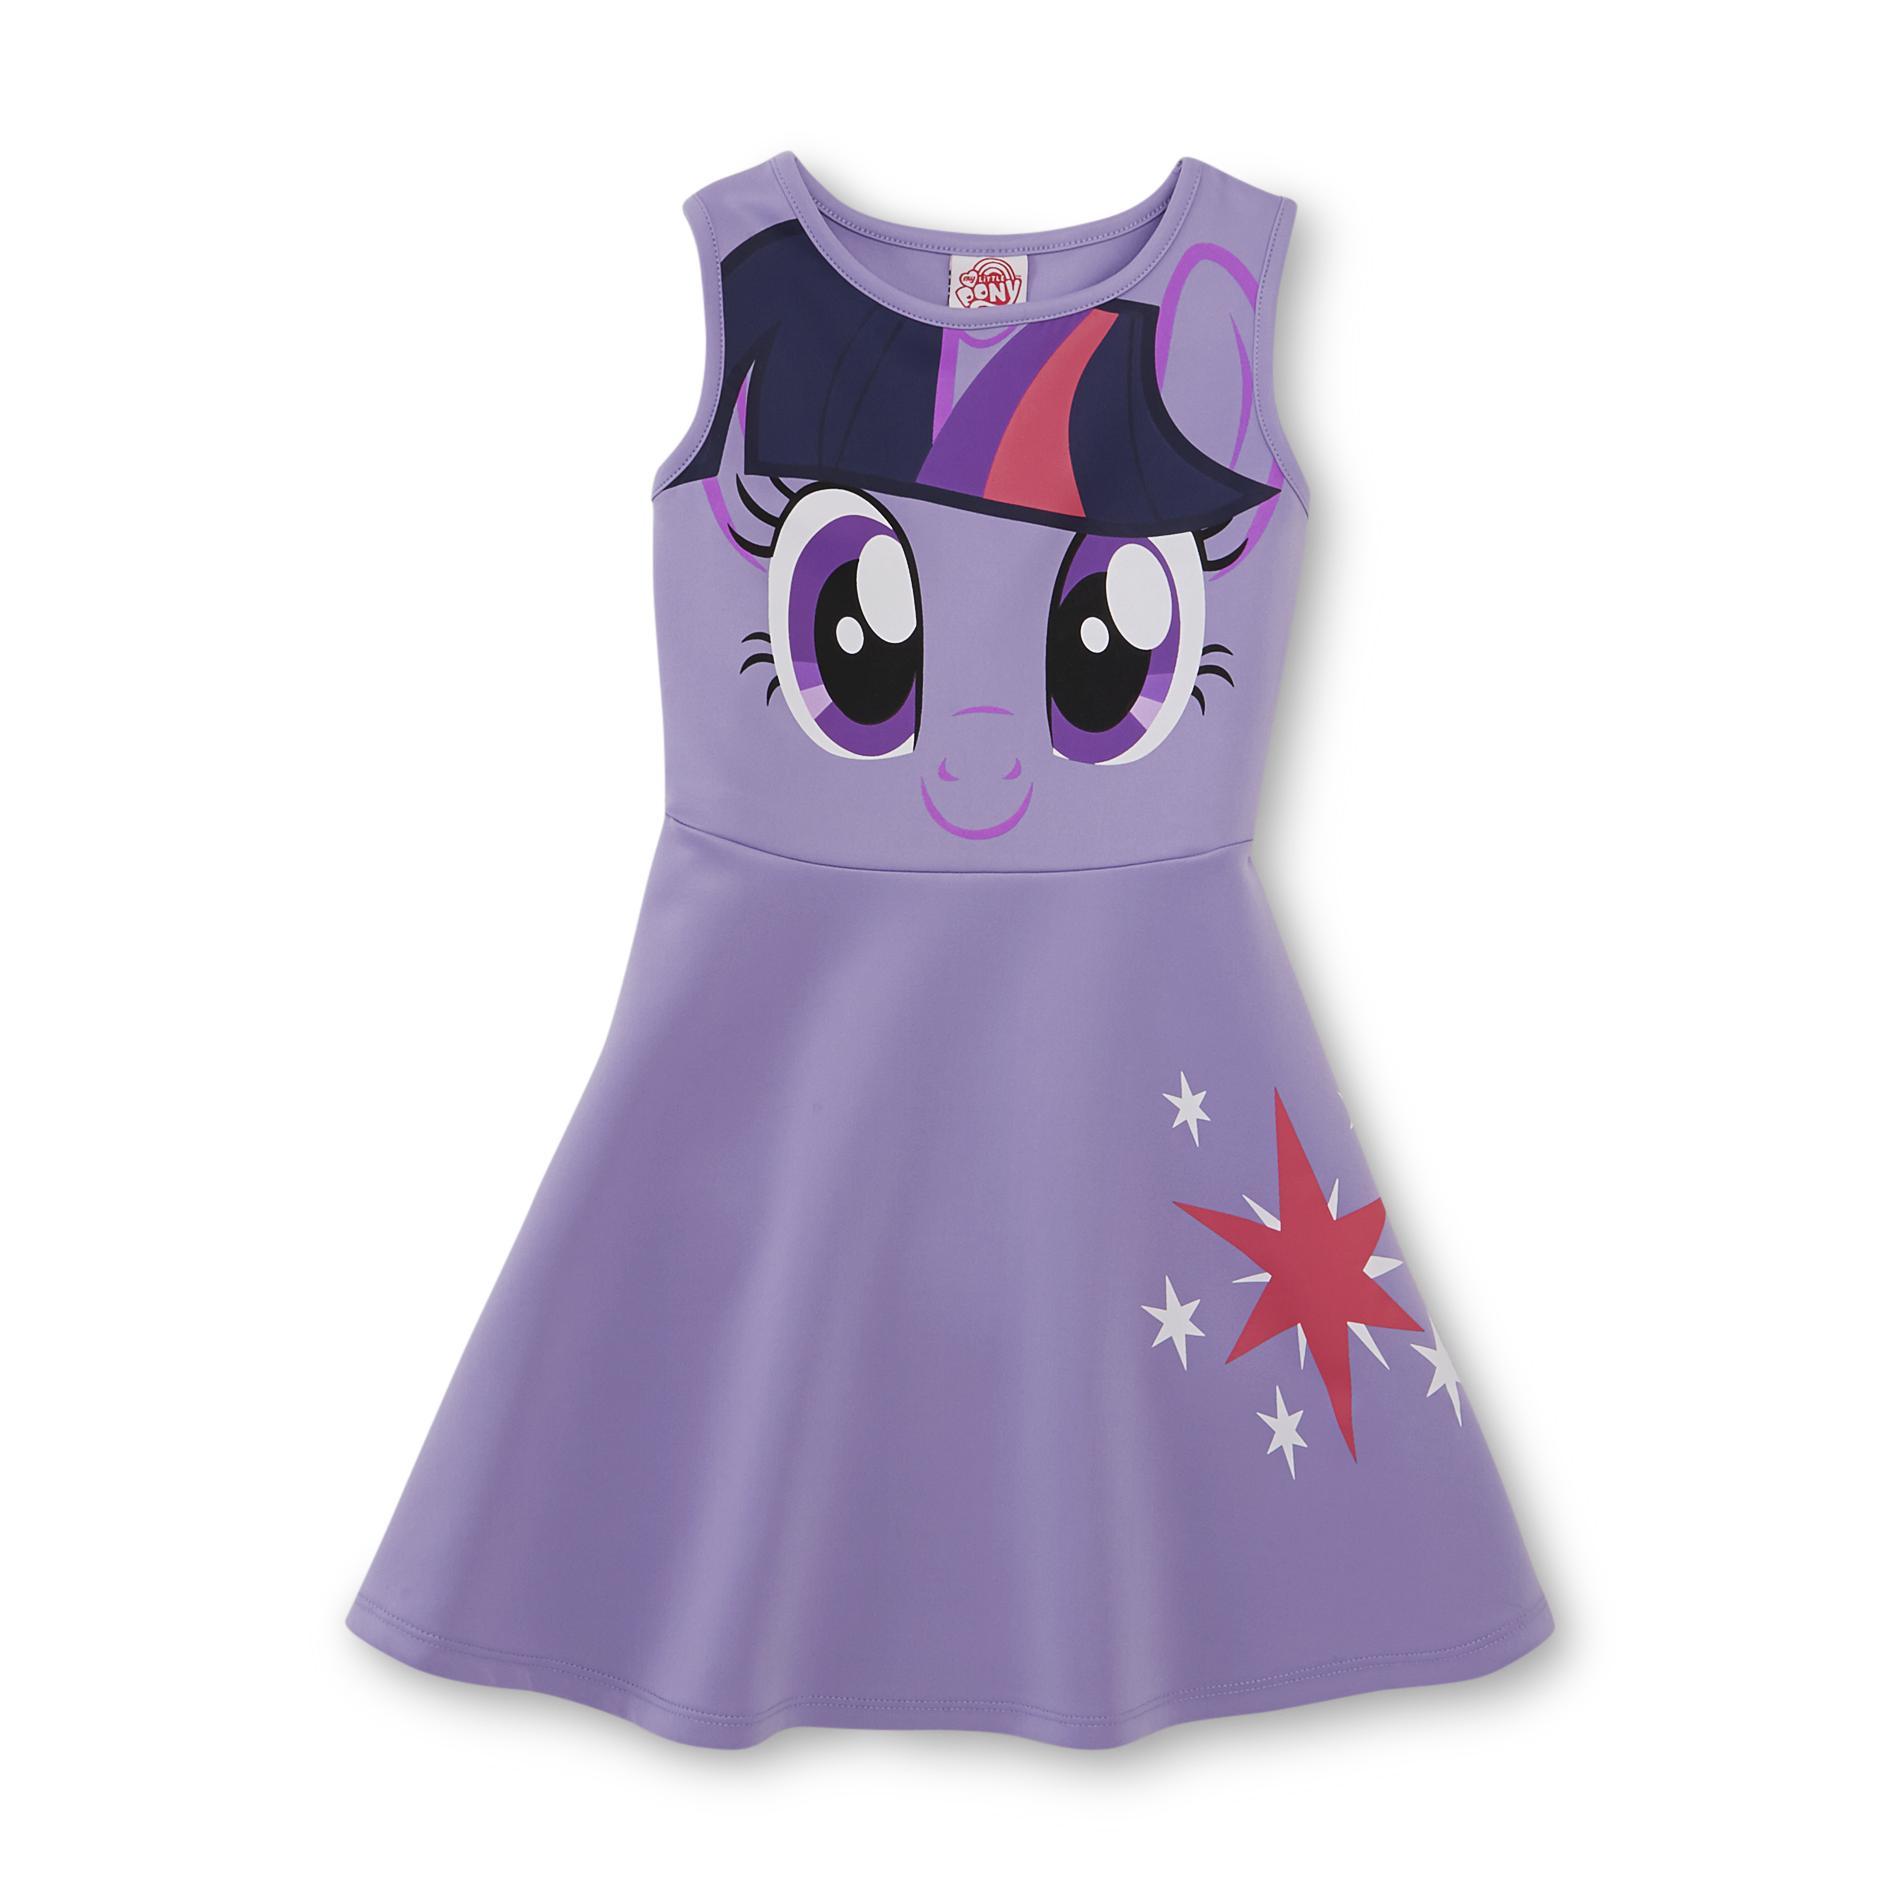 Little Pony Girl' Fit & Flare Dress - Twilight Sparkle